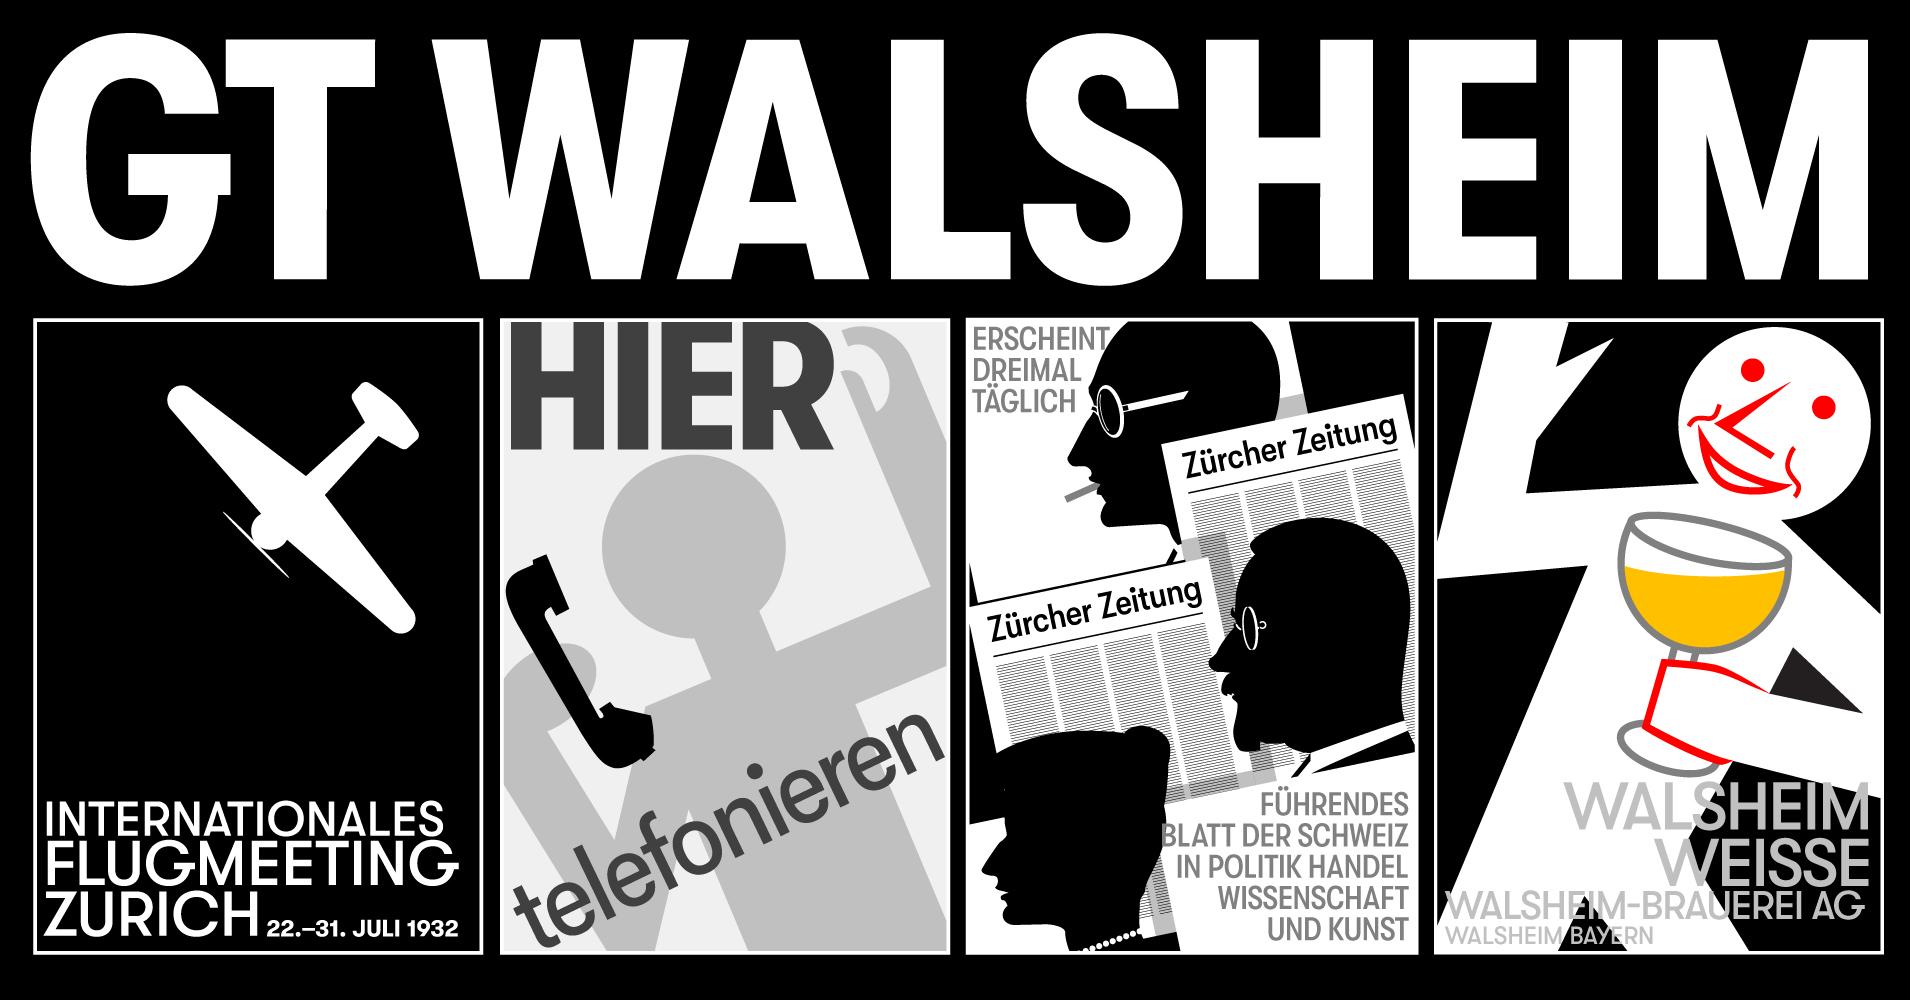 Gt walsheim free alternative dating